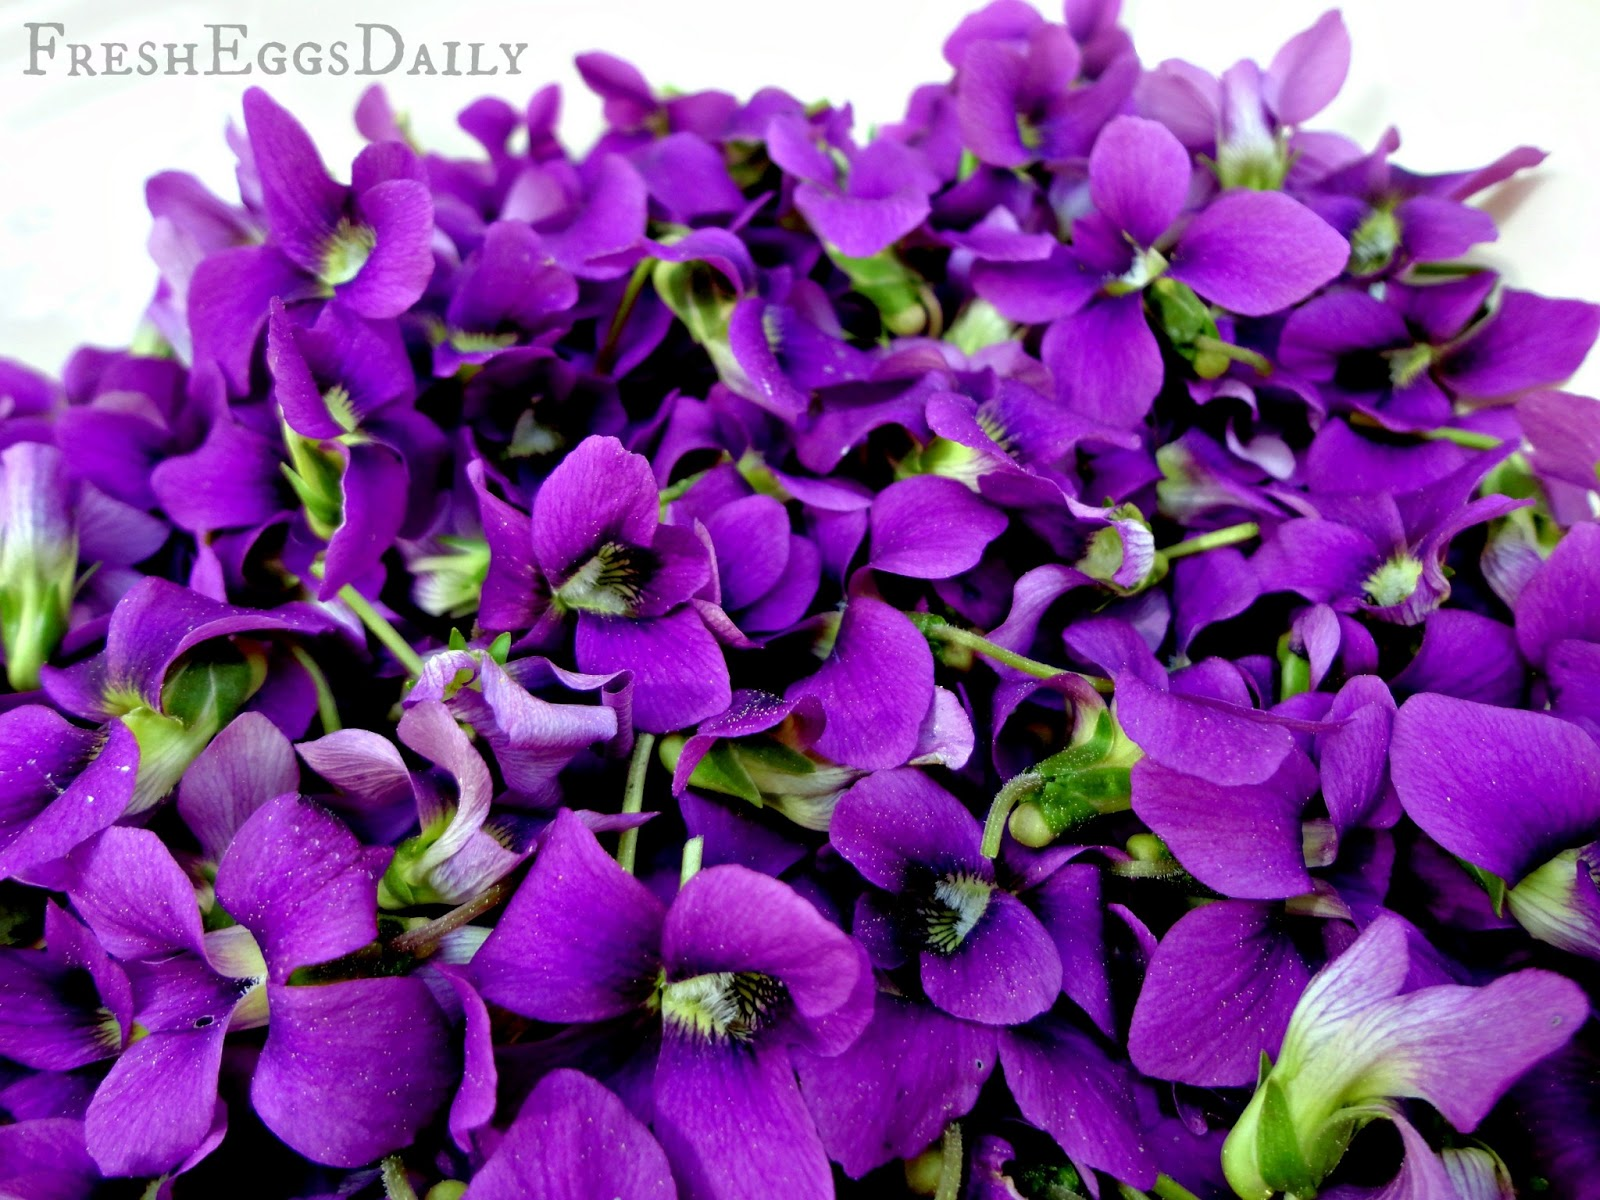 The Incredible Edible Violet - Homemade Violet Soda ...